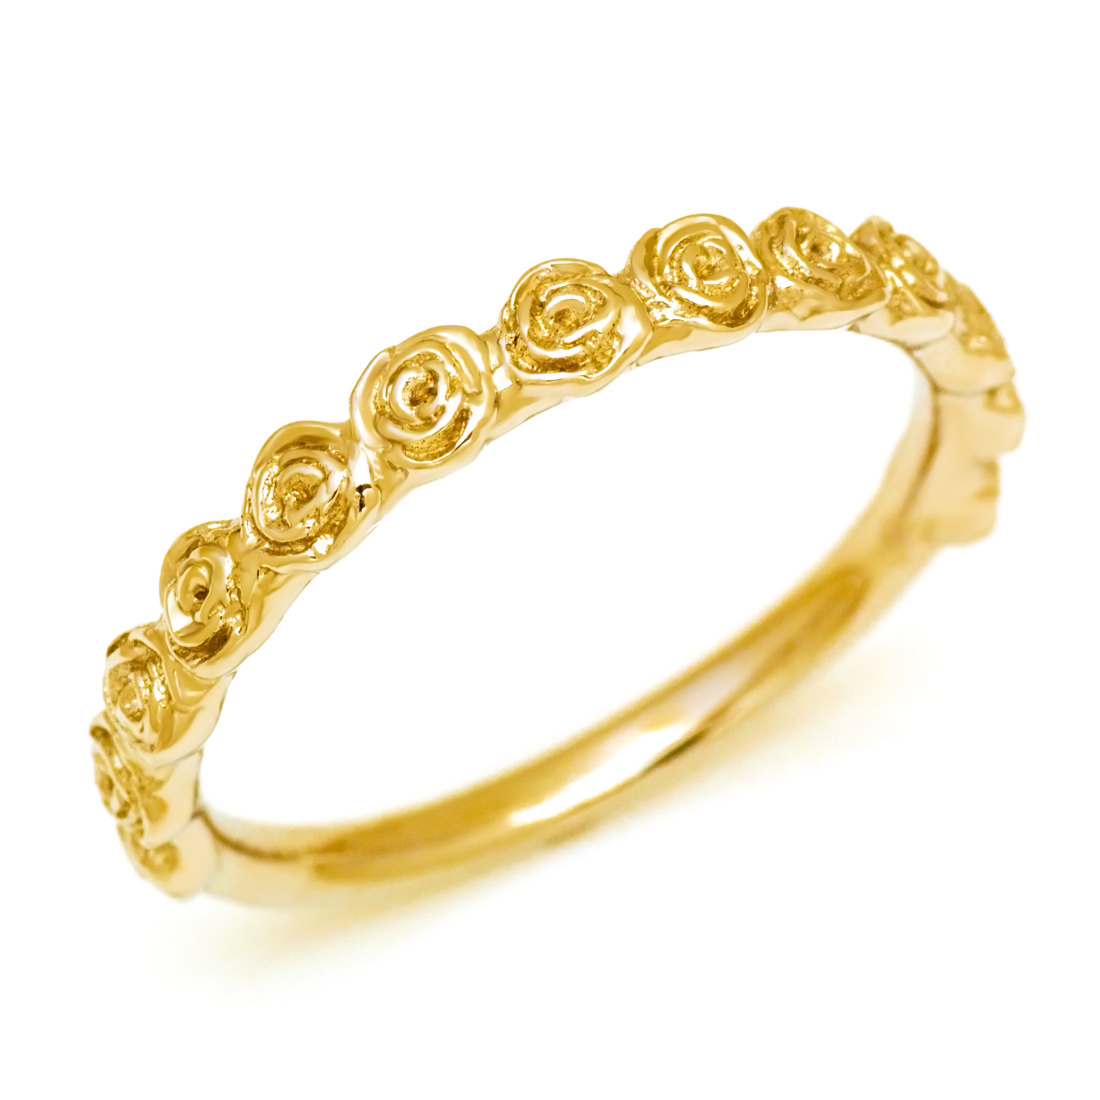 【GWクーポン配布中】K18 バラモチーフ リング 「rosa」送料無料 指輪 ゴールド 18K 18金 地金リング メタルリング 薔薇 刻印 文字入れ メッセージ ギフト 贈り物 ピンキーリング対応可能